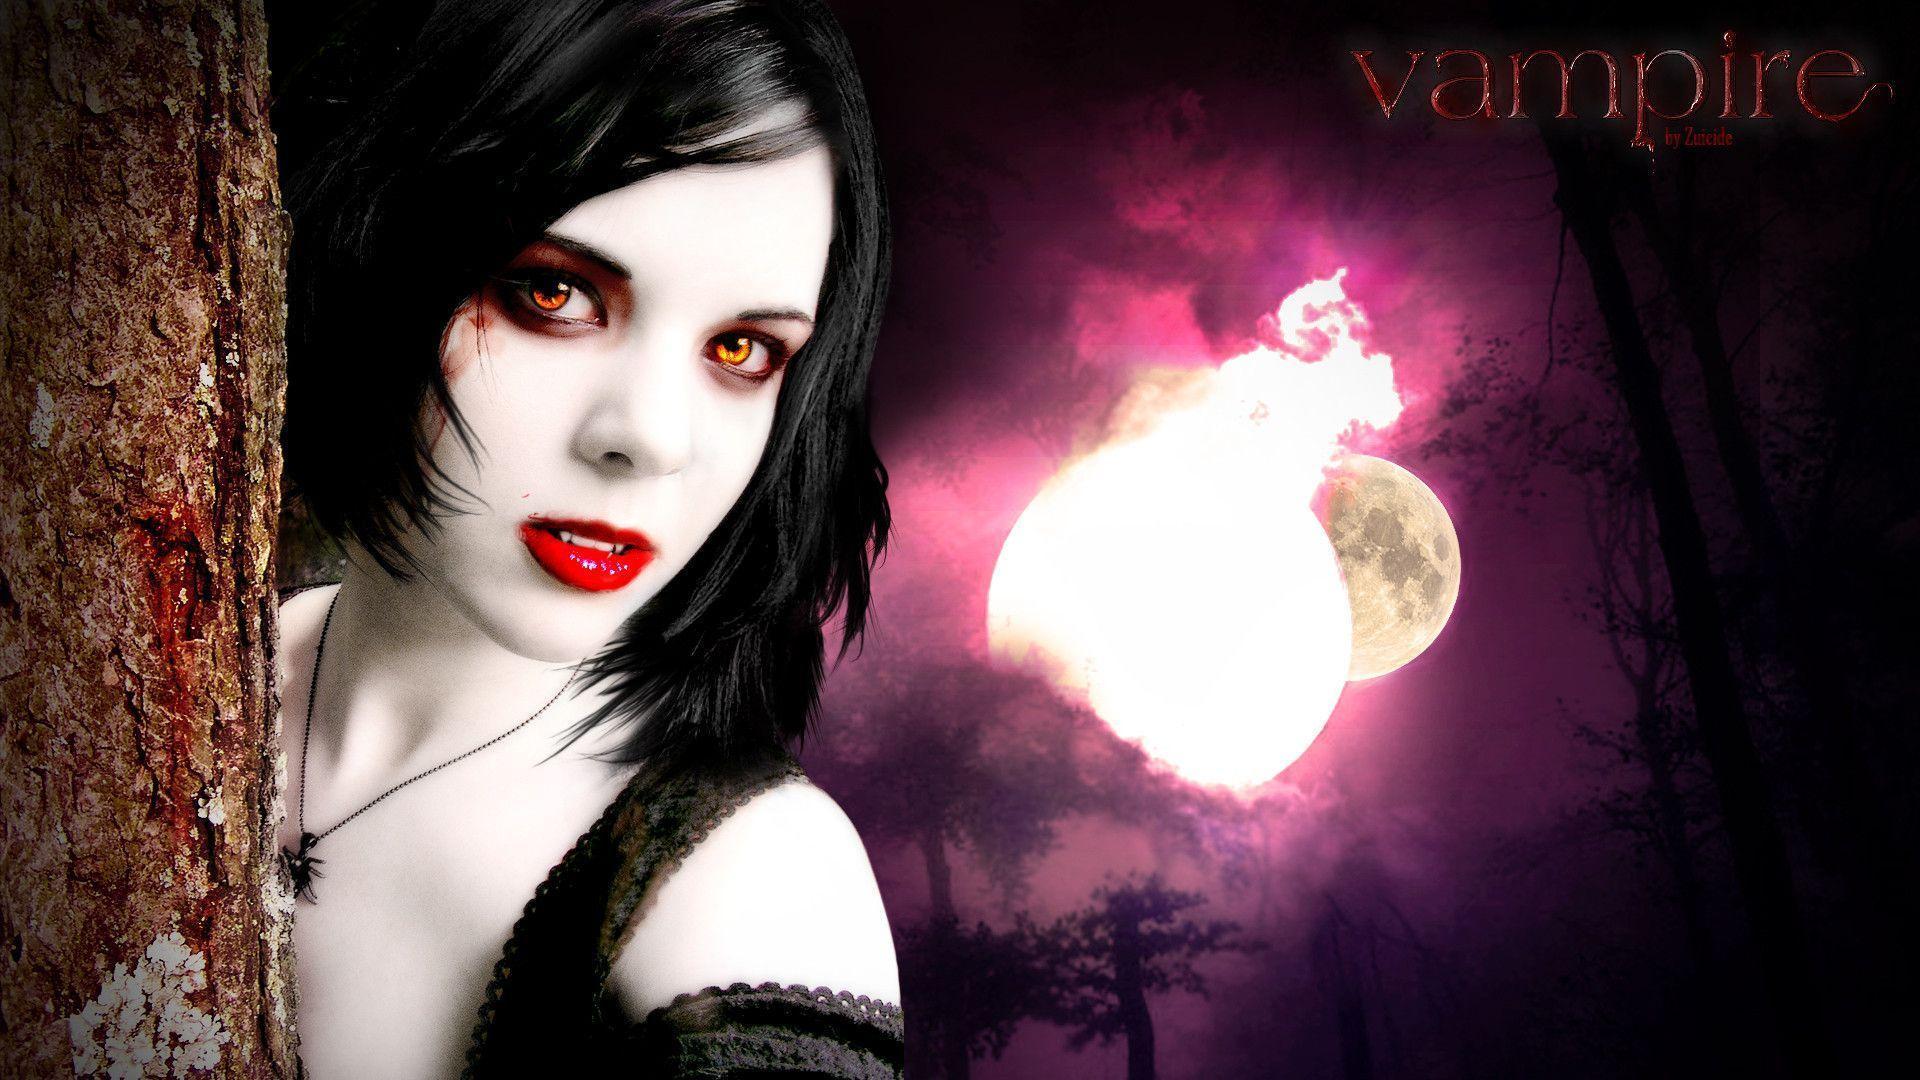 Vampire Wallpapers Free - Wallpaper Cave